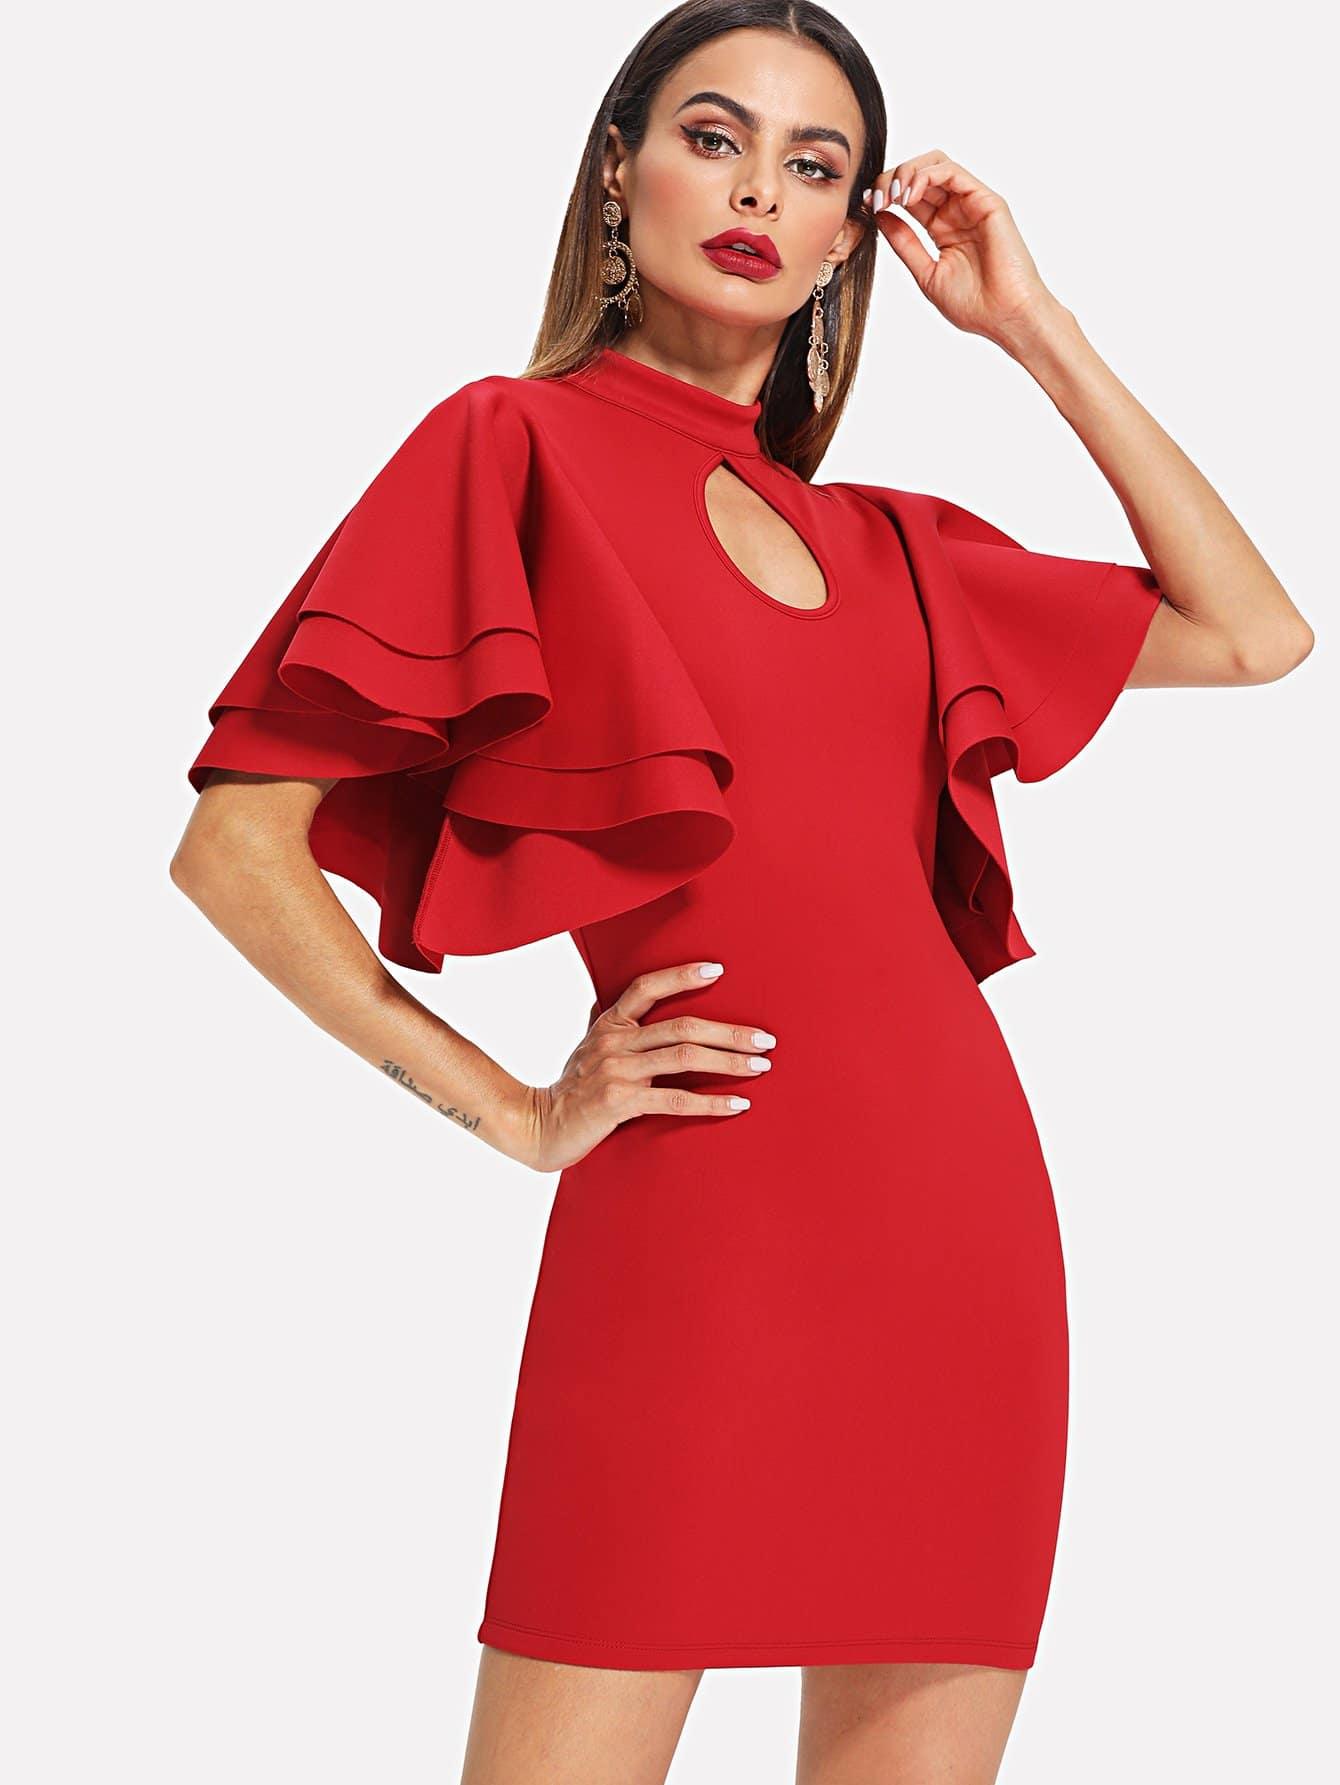 Cut Out Neck Layered Exaggerate Ruffle Sleeve Dress burgundy contrast sheer neck layered sleeve ruffle dress